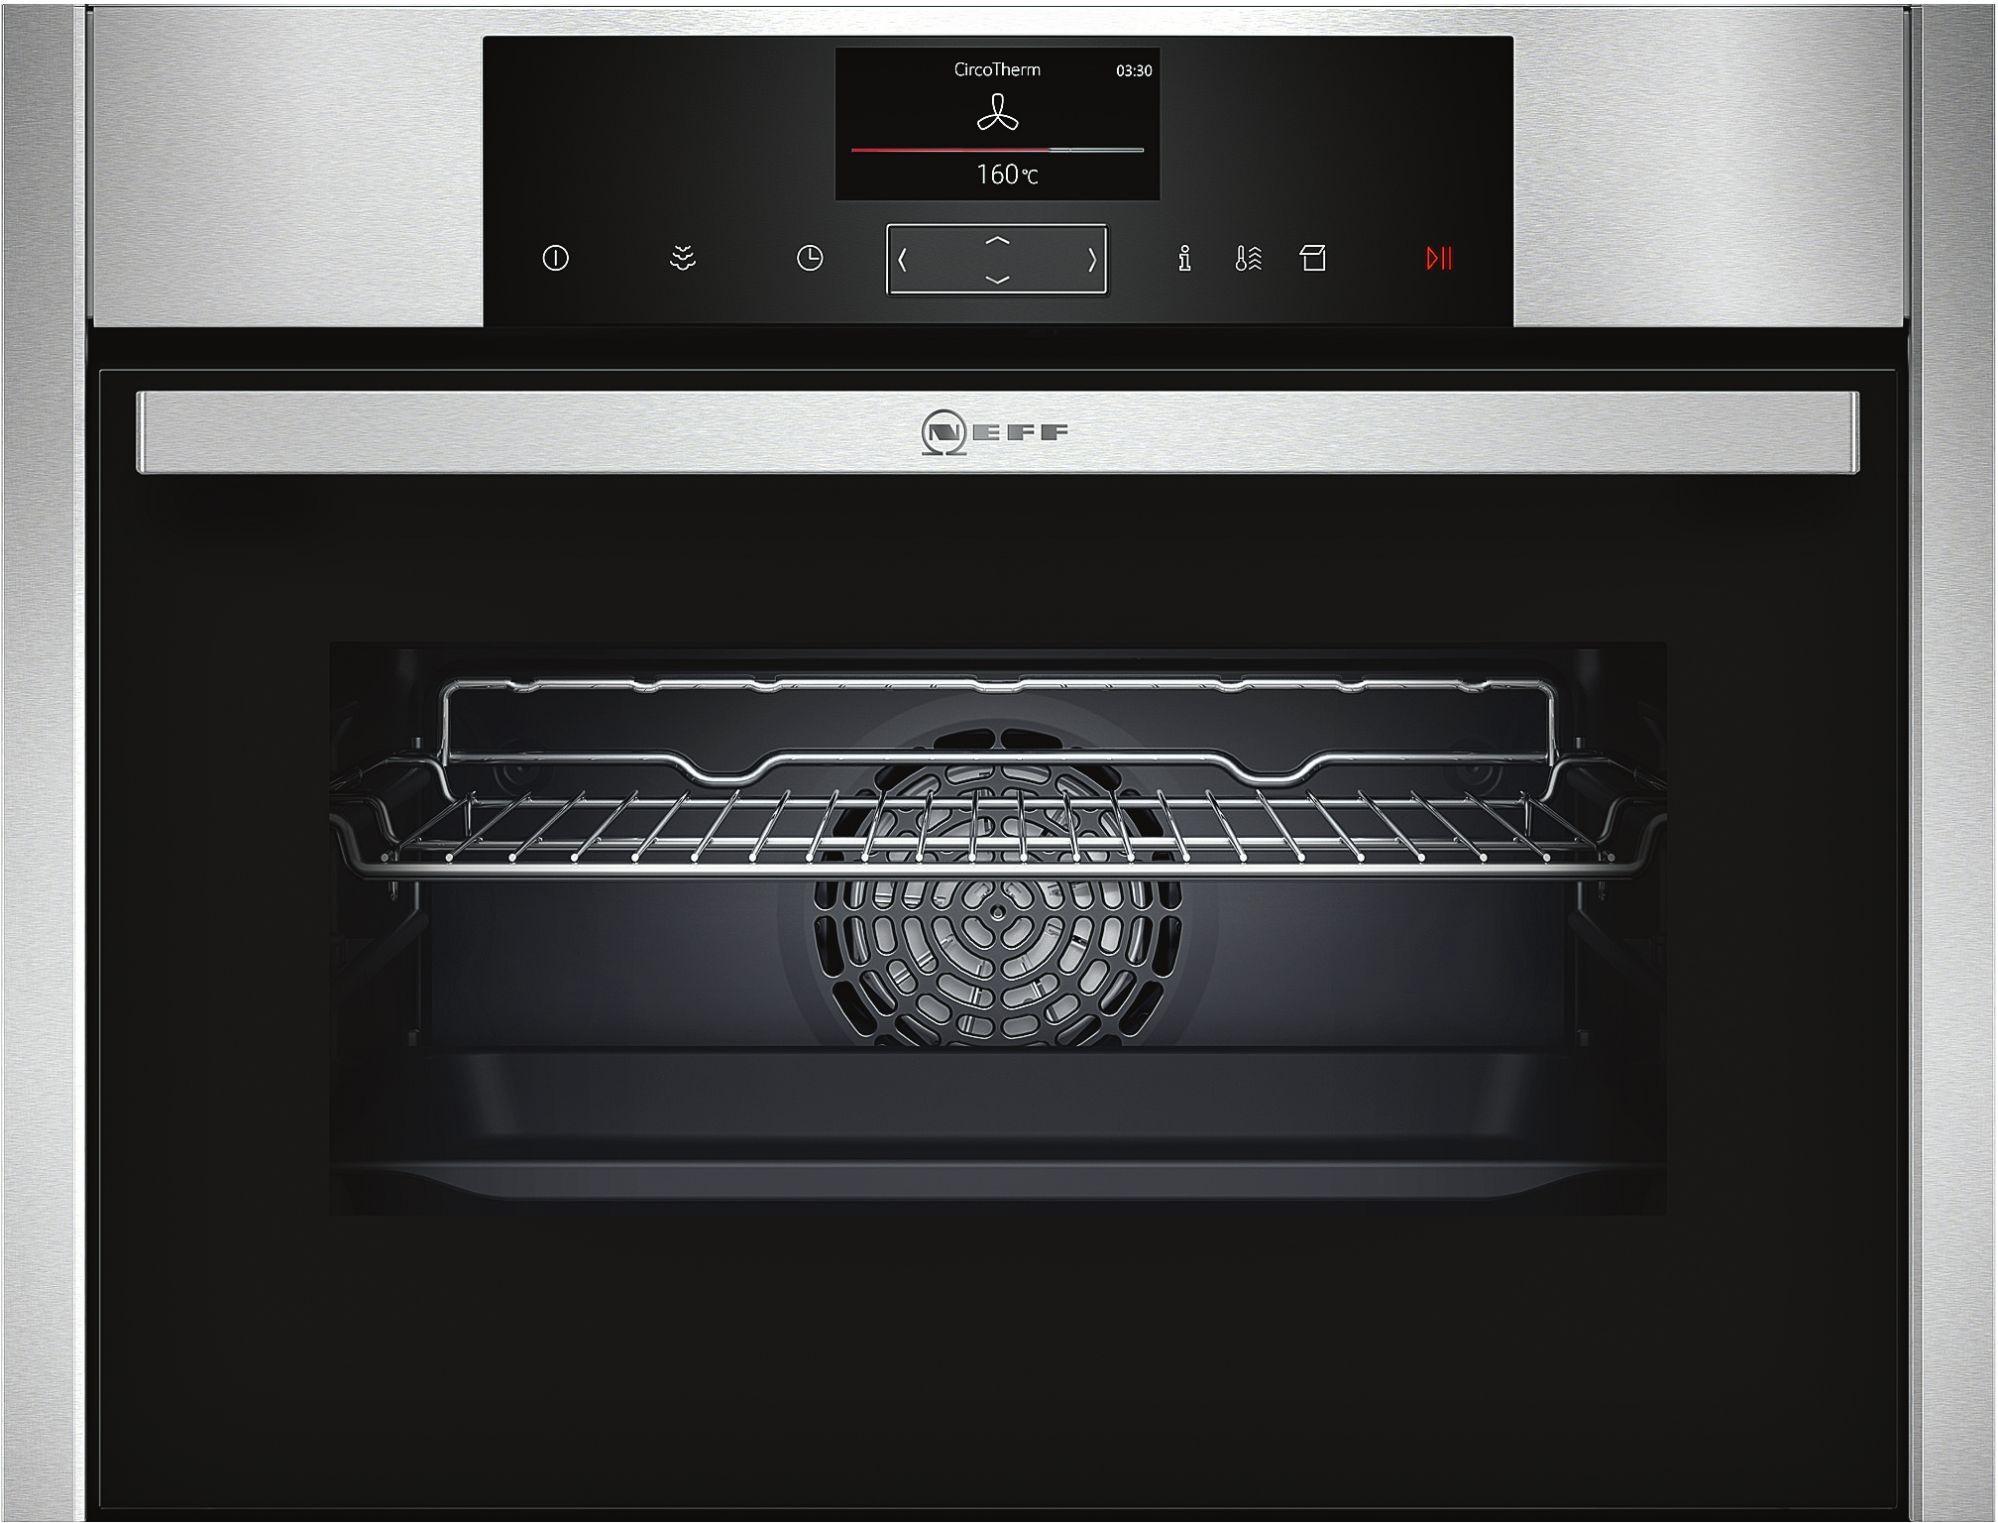 teamsix z13cu11x0 neff zubeh r dampfgarer. Black Bedroom Furniture Sets. Home Design Ideas